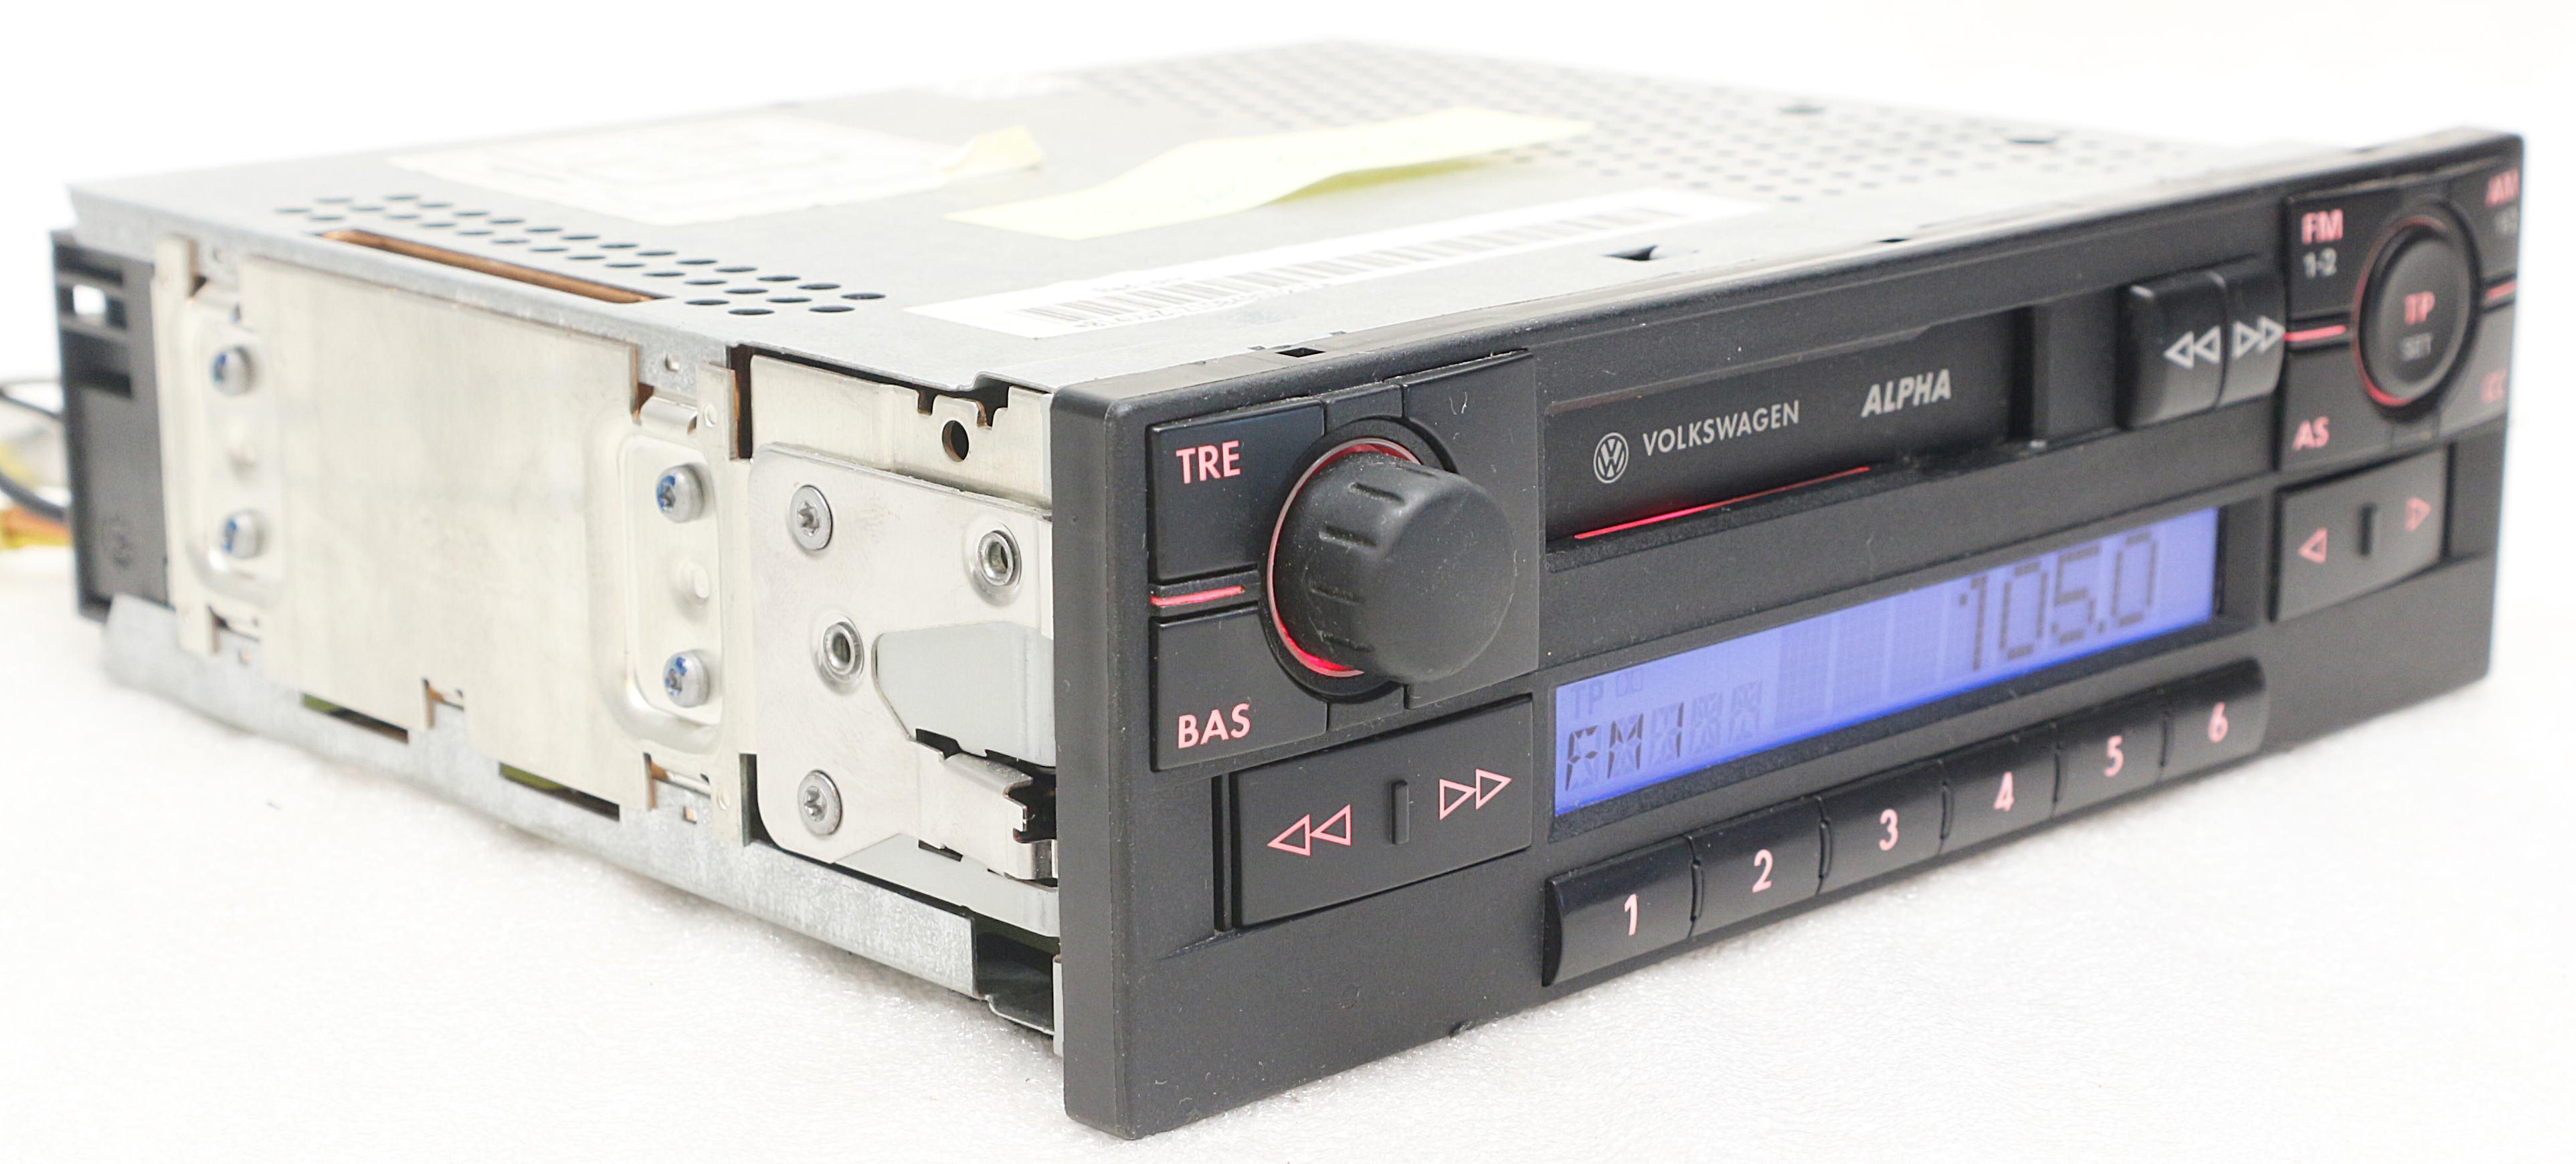 vw alpha 5 lupo polo bvx radio kassette blaupunkt. Black Bedroom Furniture Sets. Home Design Ideas